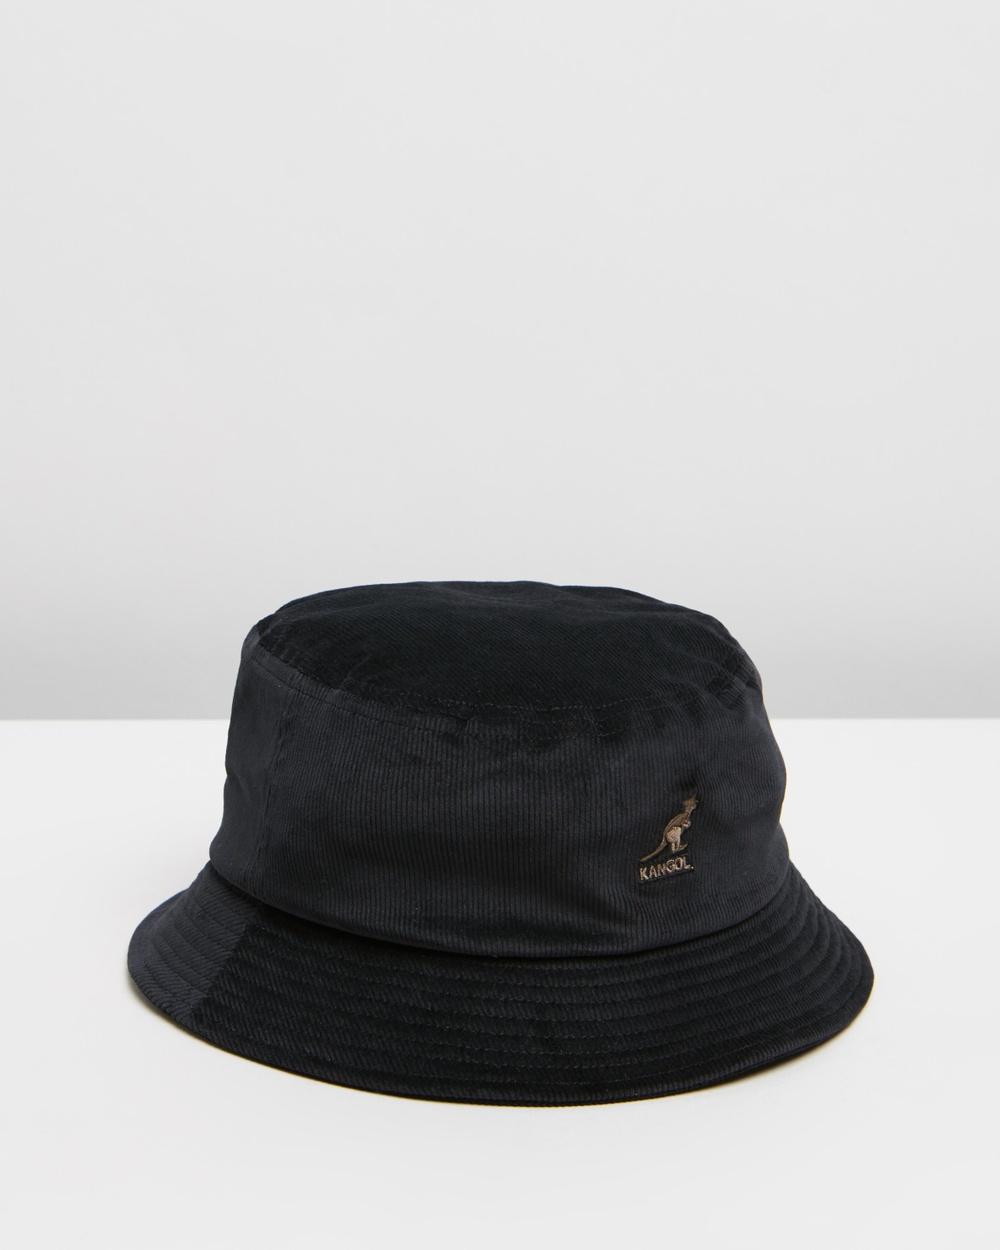 Kangol Cord Bucket Hat Hats Black